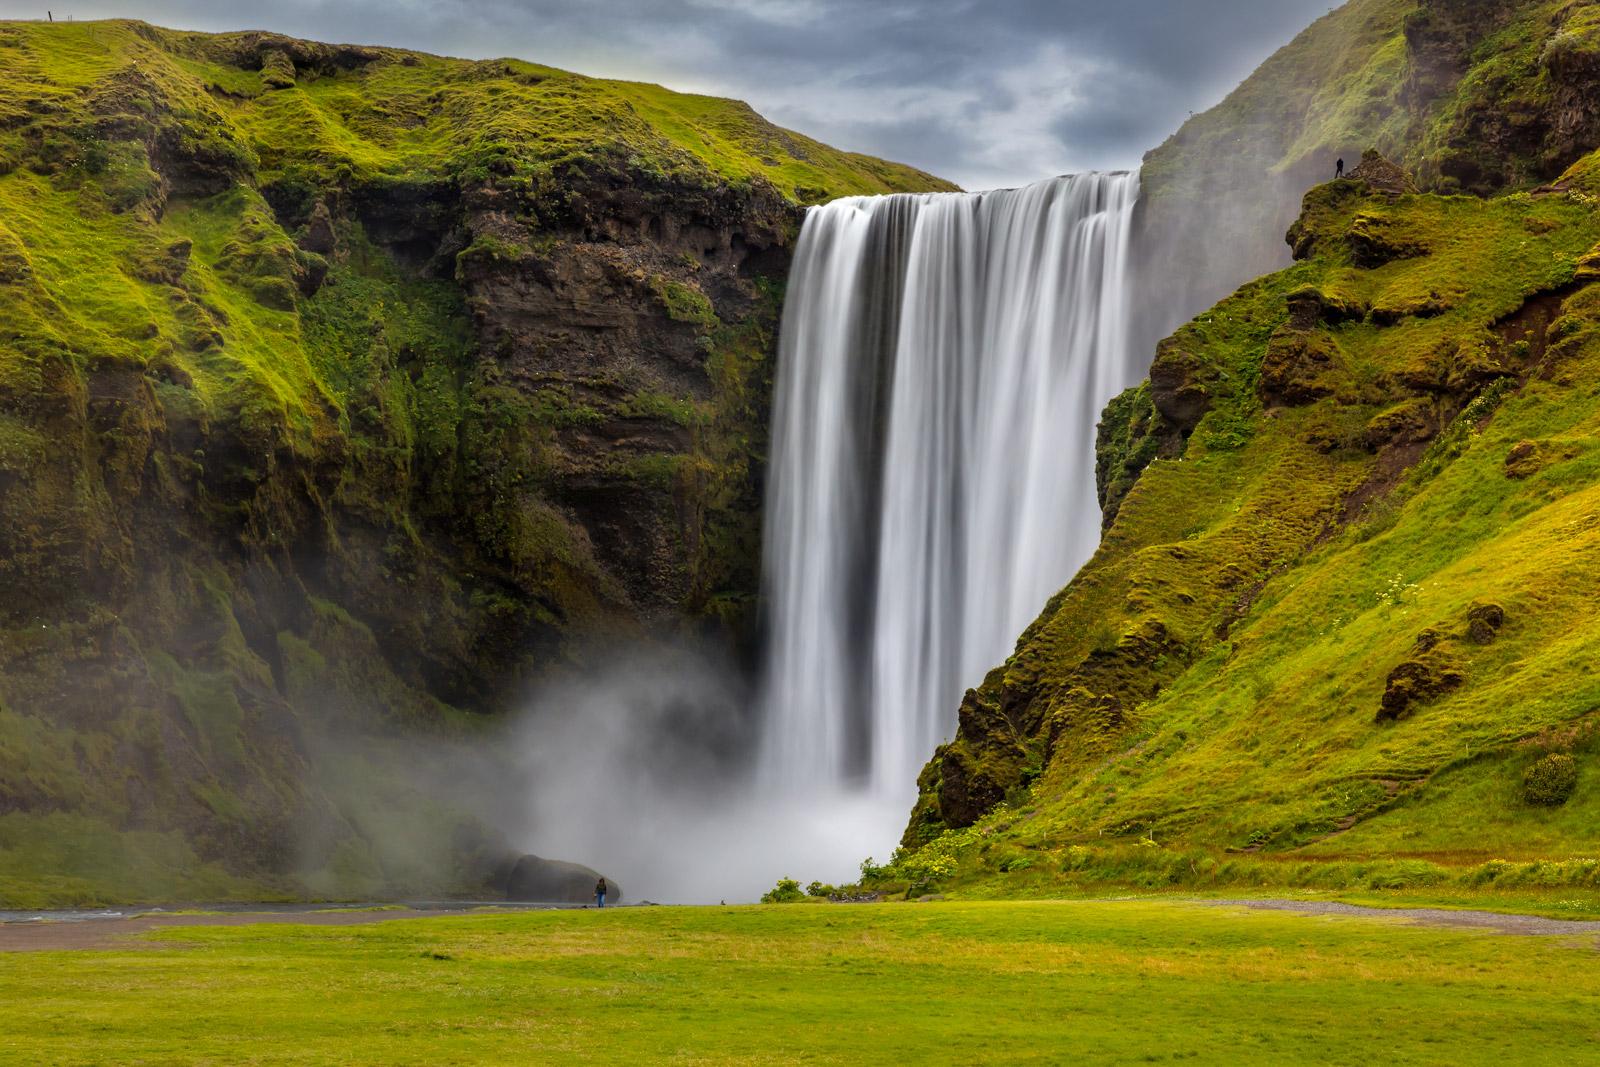 iceland, waterfall, skogafoss, limited edition, photograph, fine art, landscape, photo